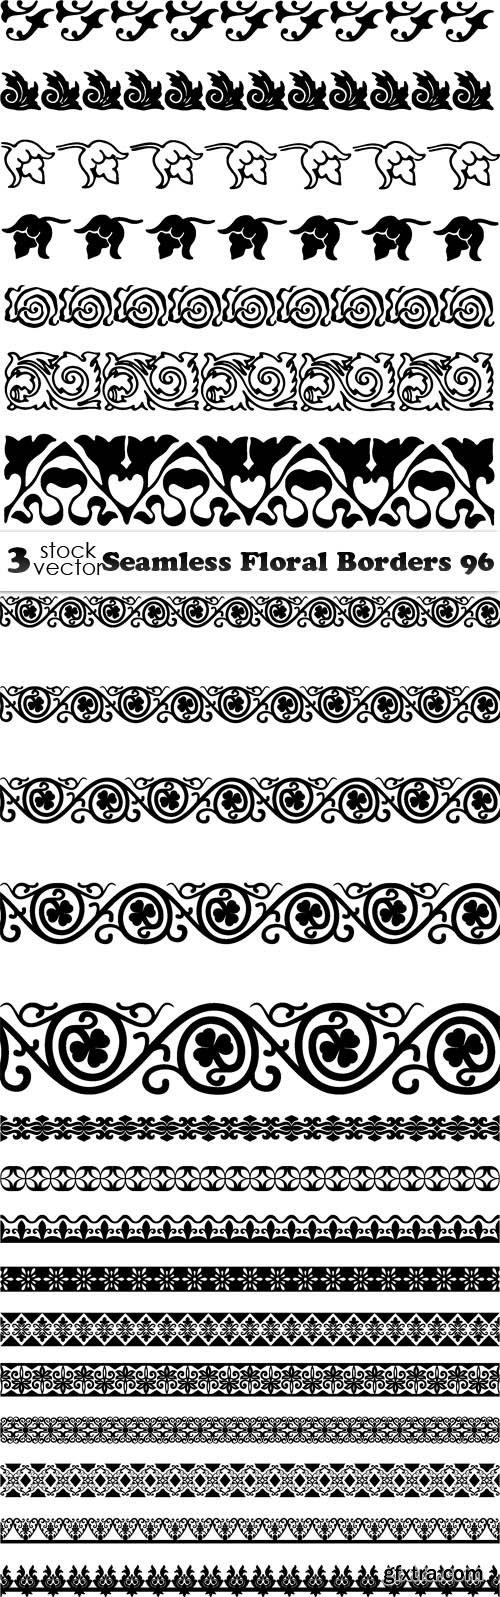 Vectors - Seamless Floral Borders 96